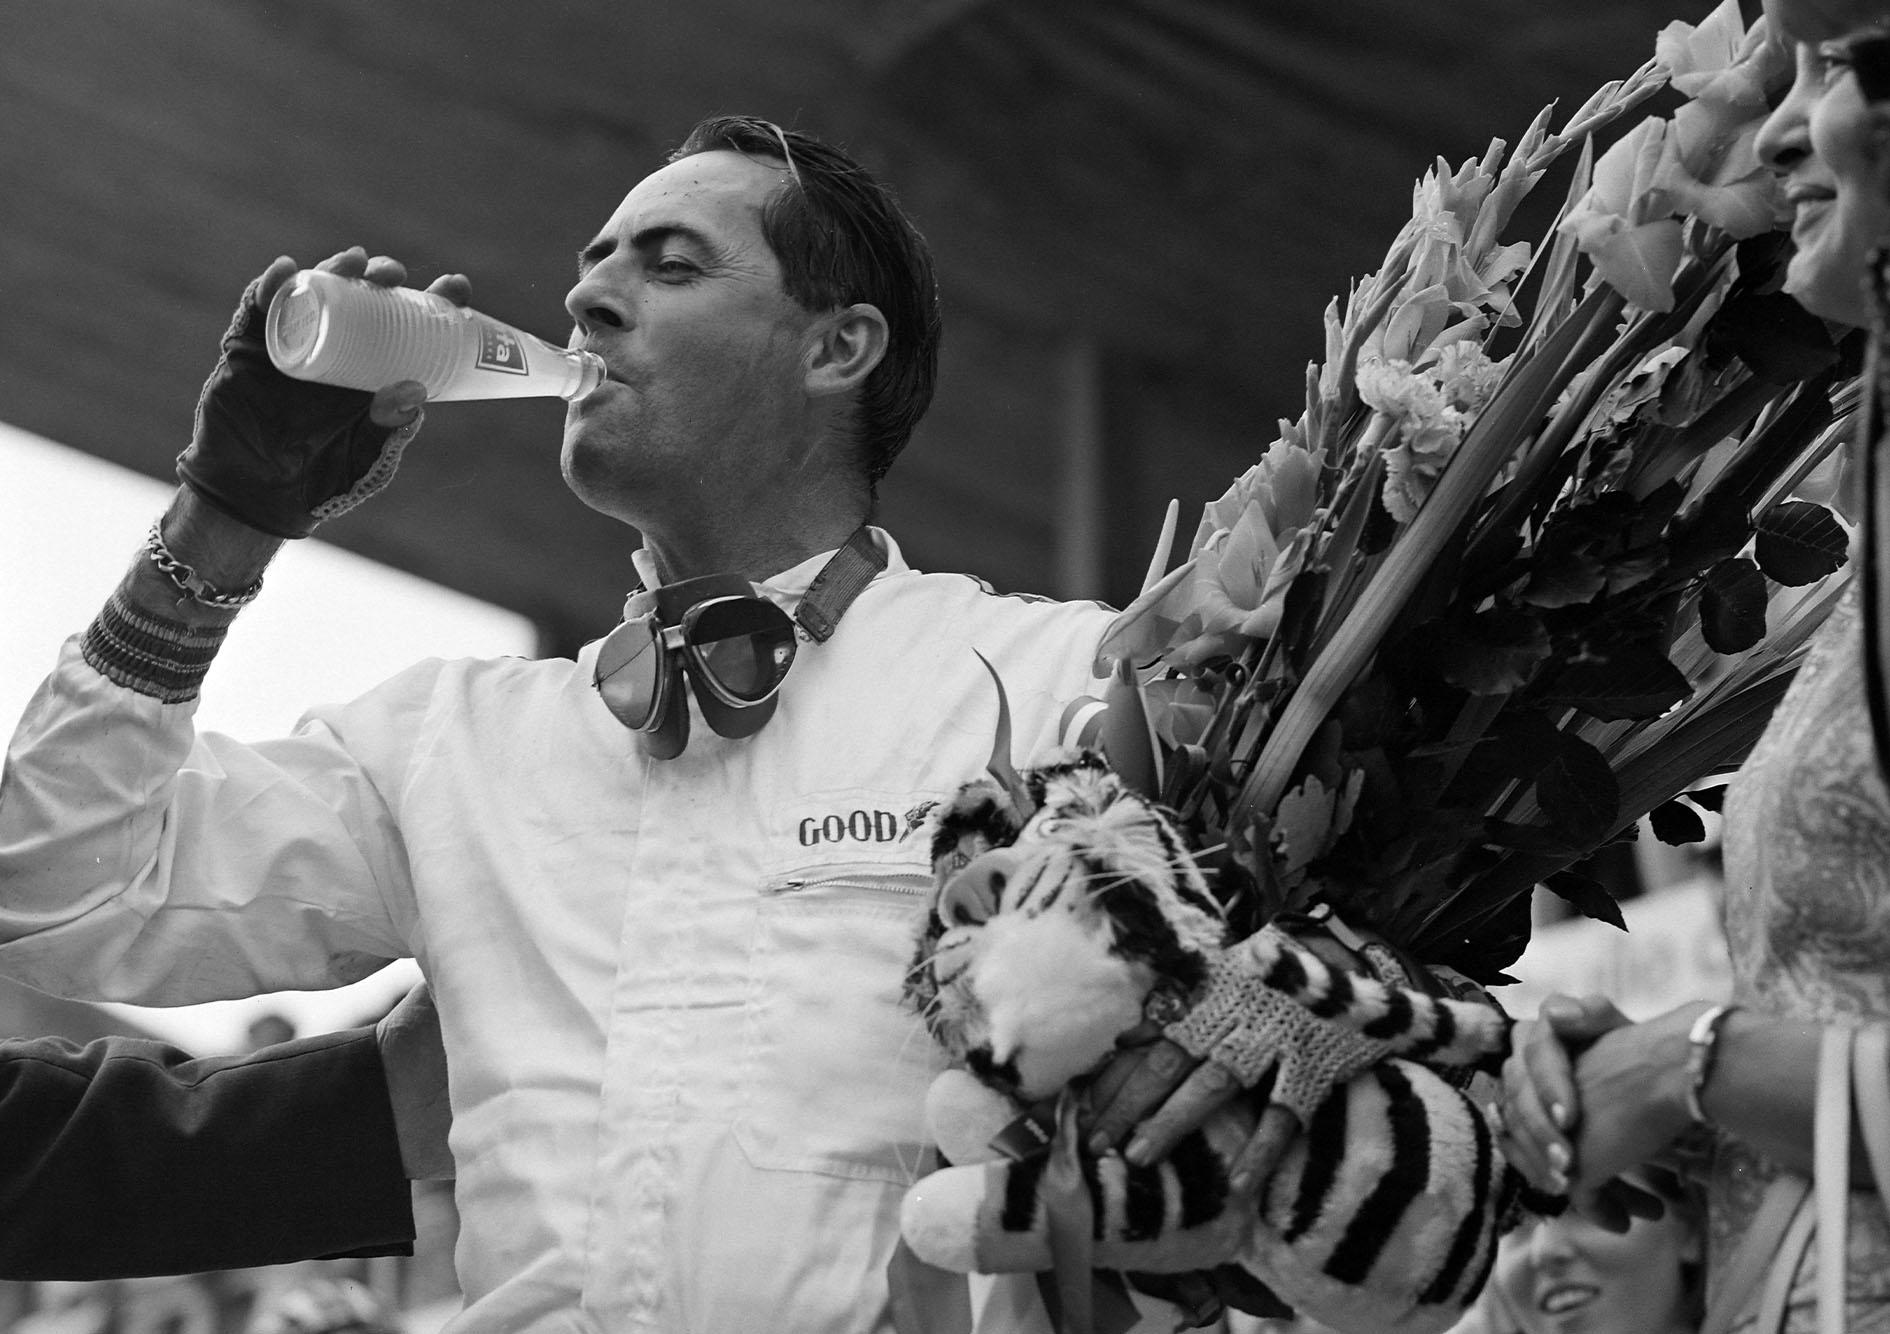 Race winner Jack Brabham celebrates with a drink on the podium.